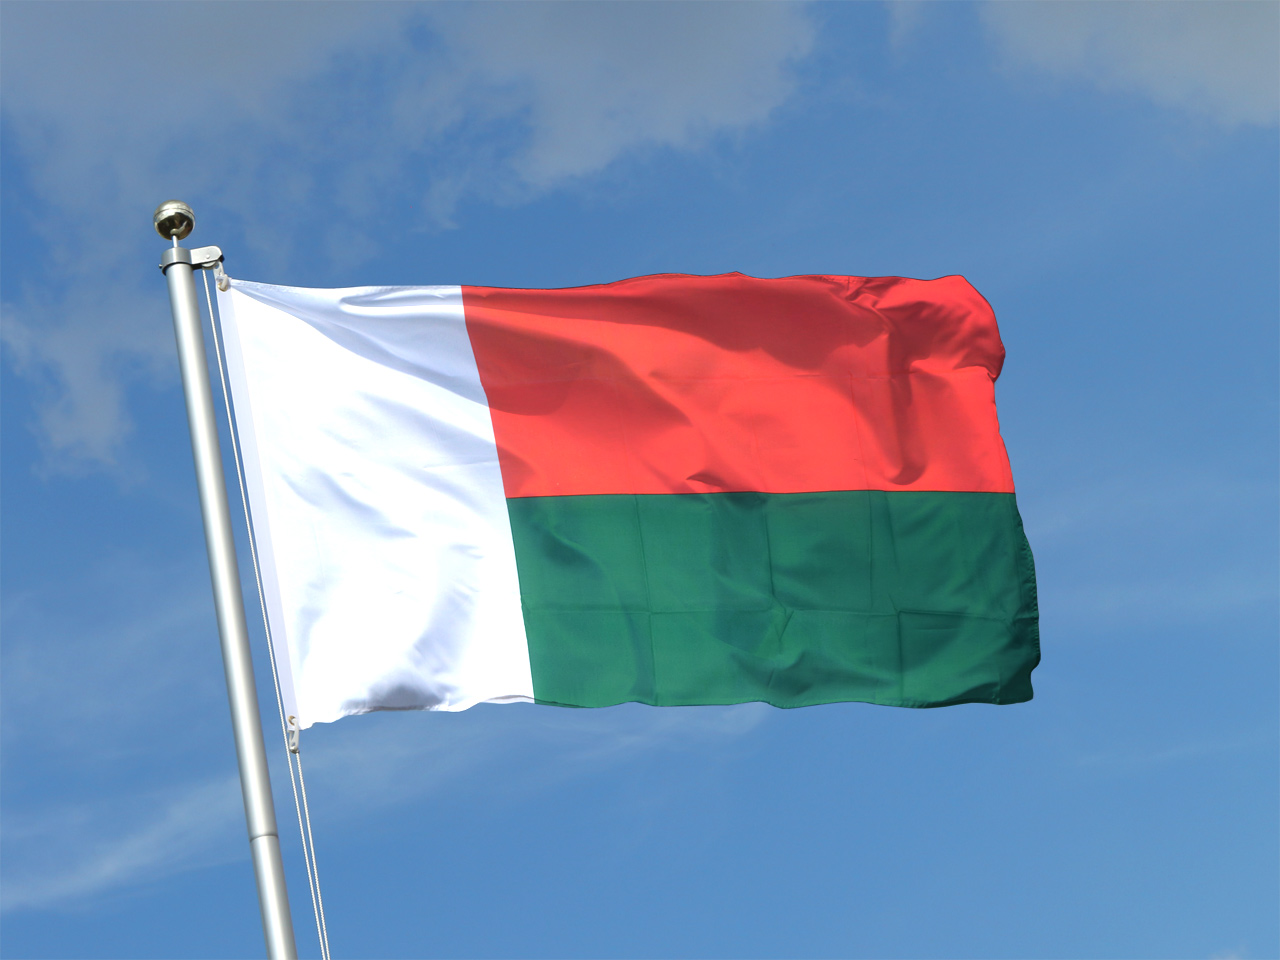 Madagascar X Ft Flag X Cm RoyalFlags - Madagascar flag